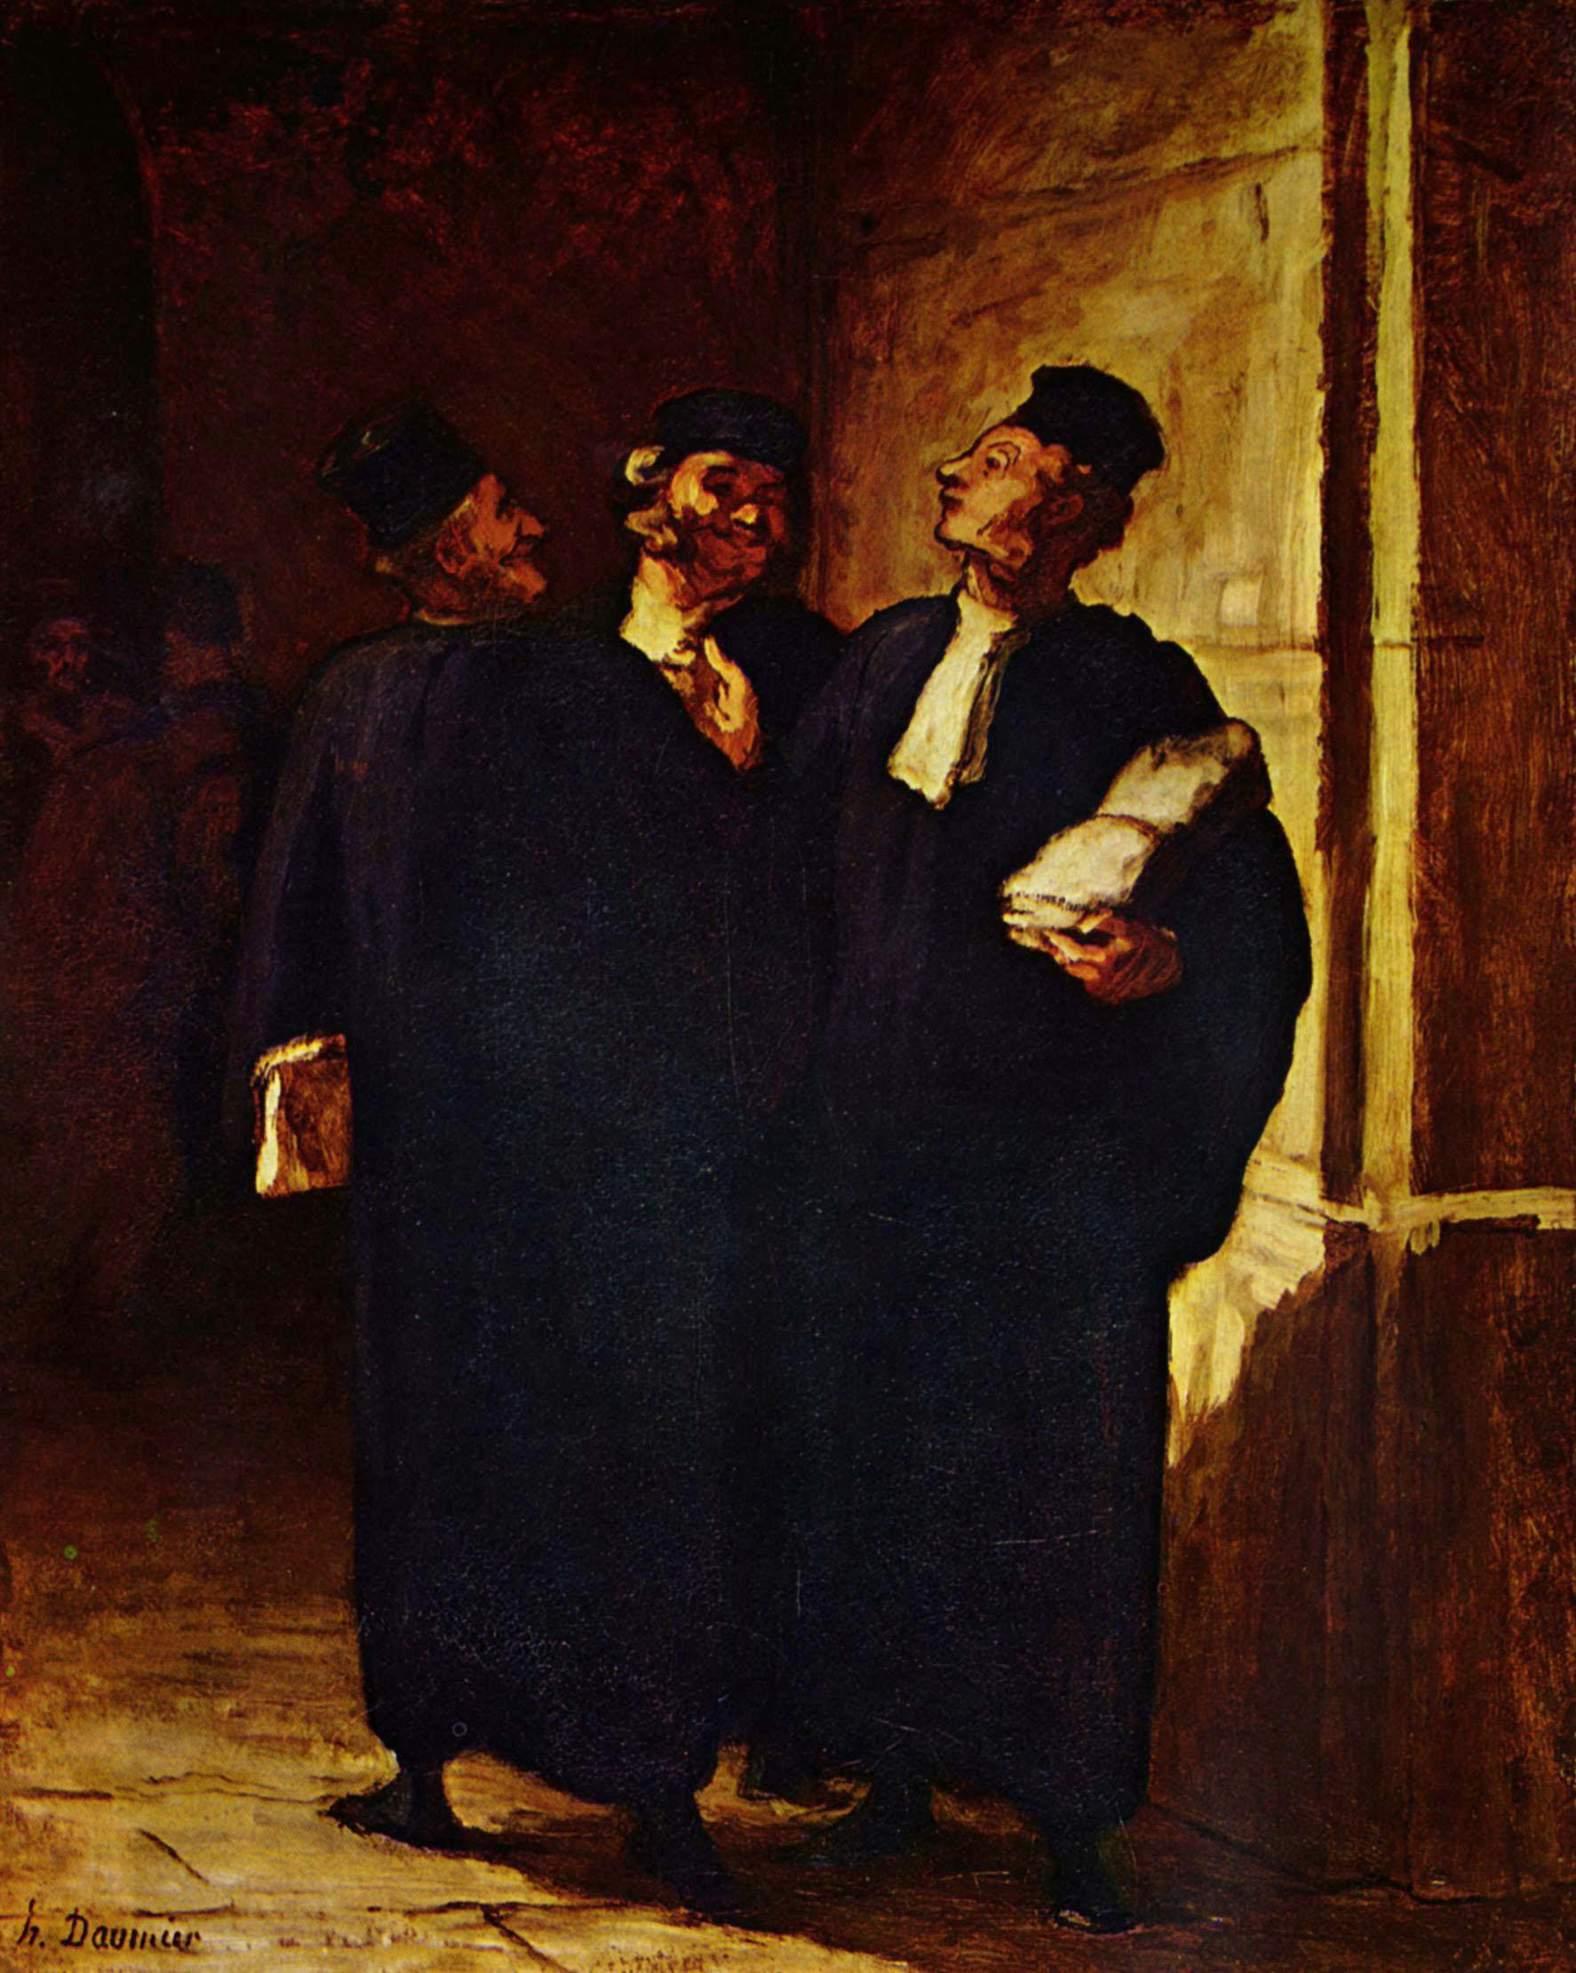 Три адвоката за разговором, Домье Оноре